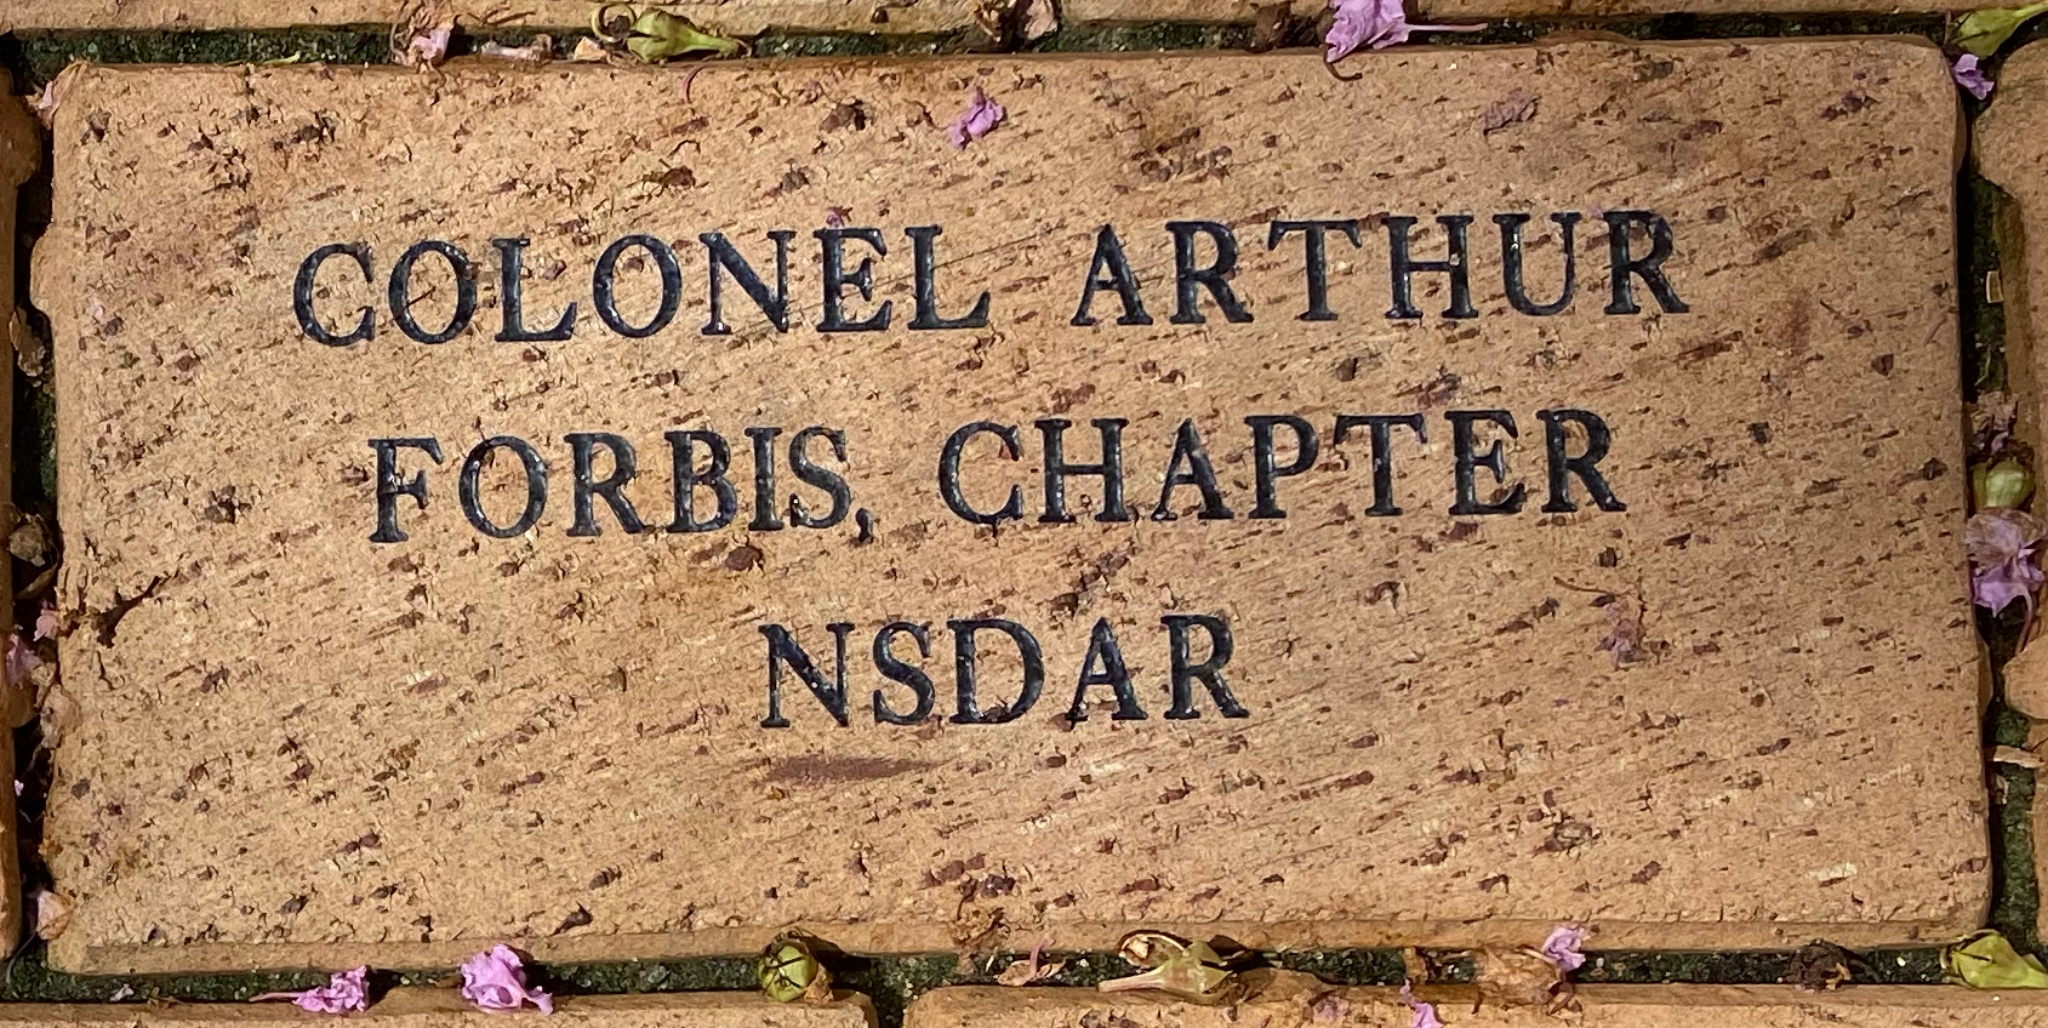 COL. ARTHUR FORBIS CHAPTER, NSDAR